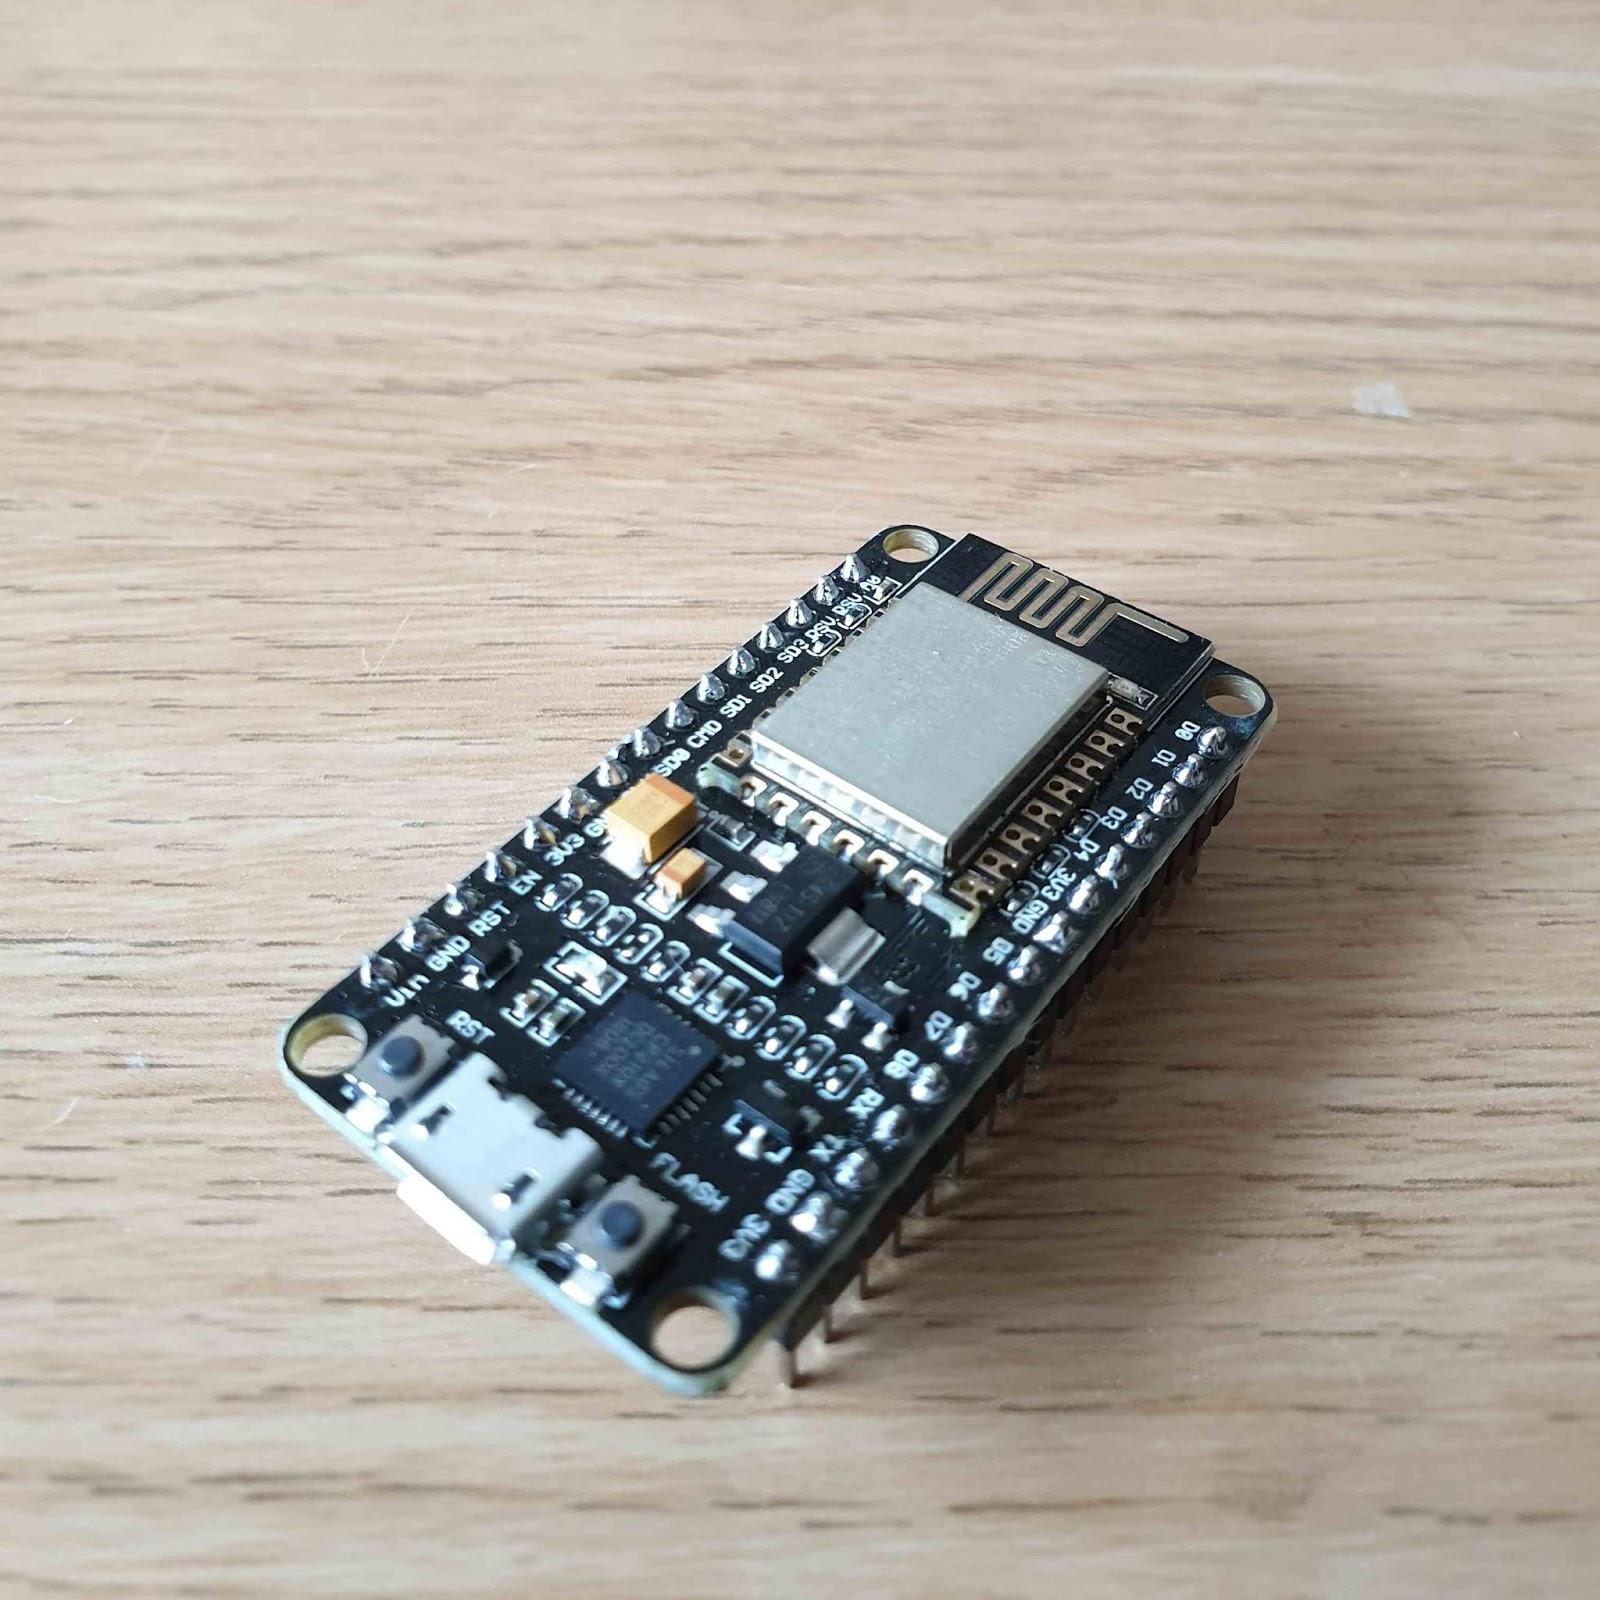 Using the NodeMCU ESP-12E board with Arduino, MicroPython